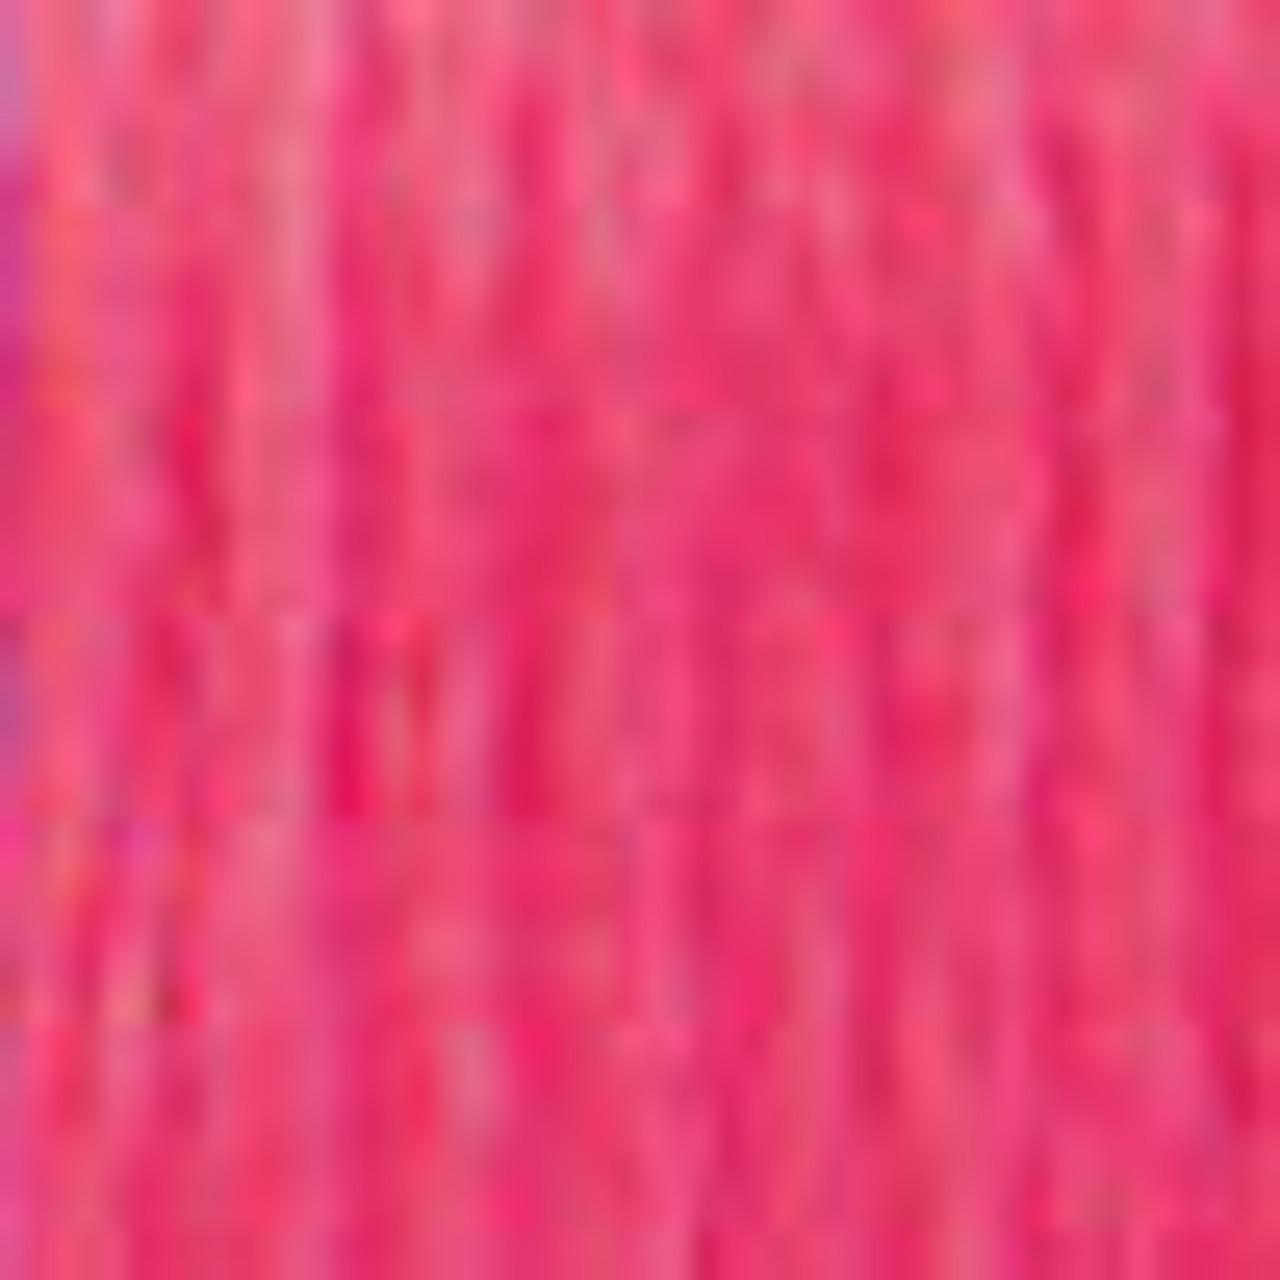 DMC # 3804 Dark Cyclamen Pink Floss / Thread